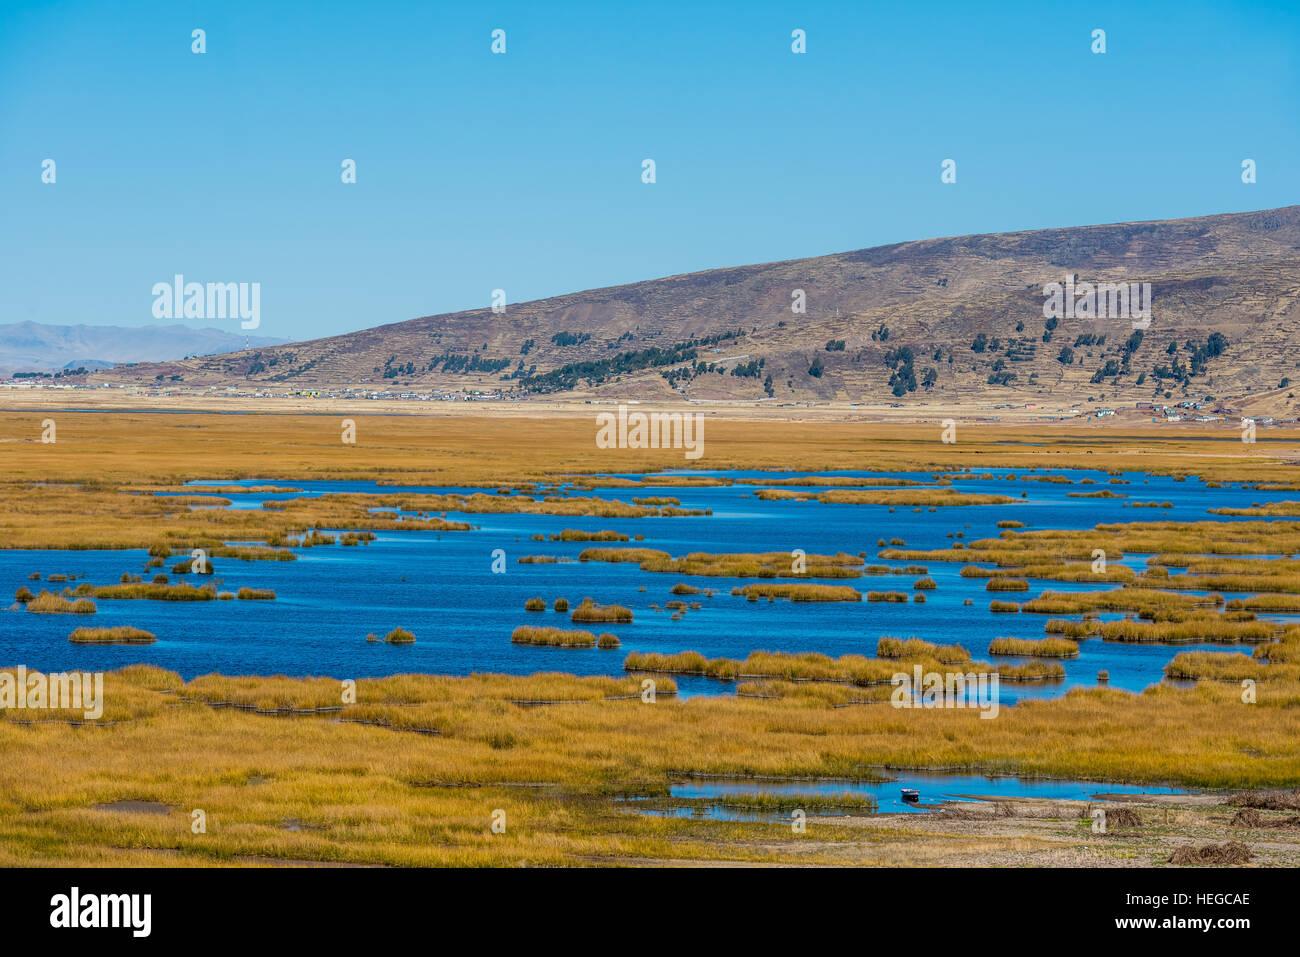 Titicaca-See in den peruanischen Anden in Peru Puno Stockbild